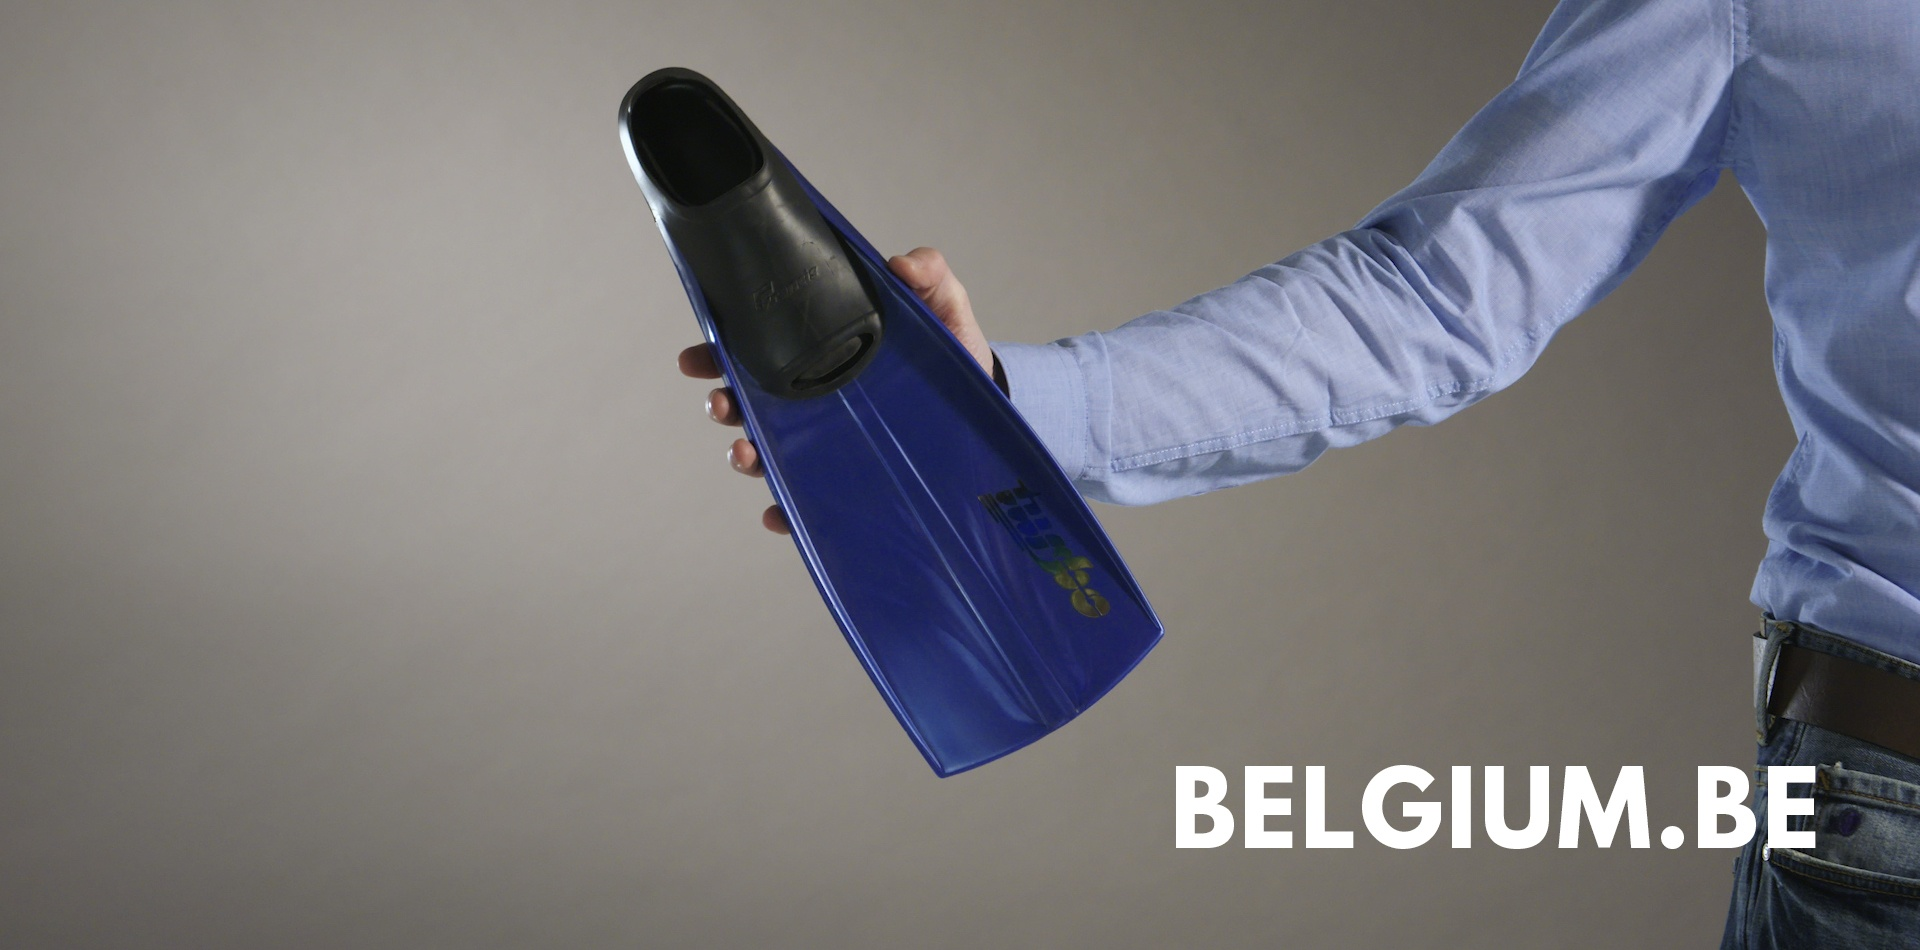 TV Commercial Belgium.be..